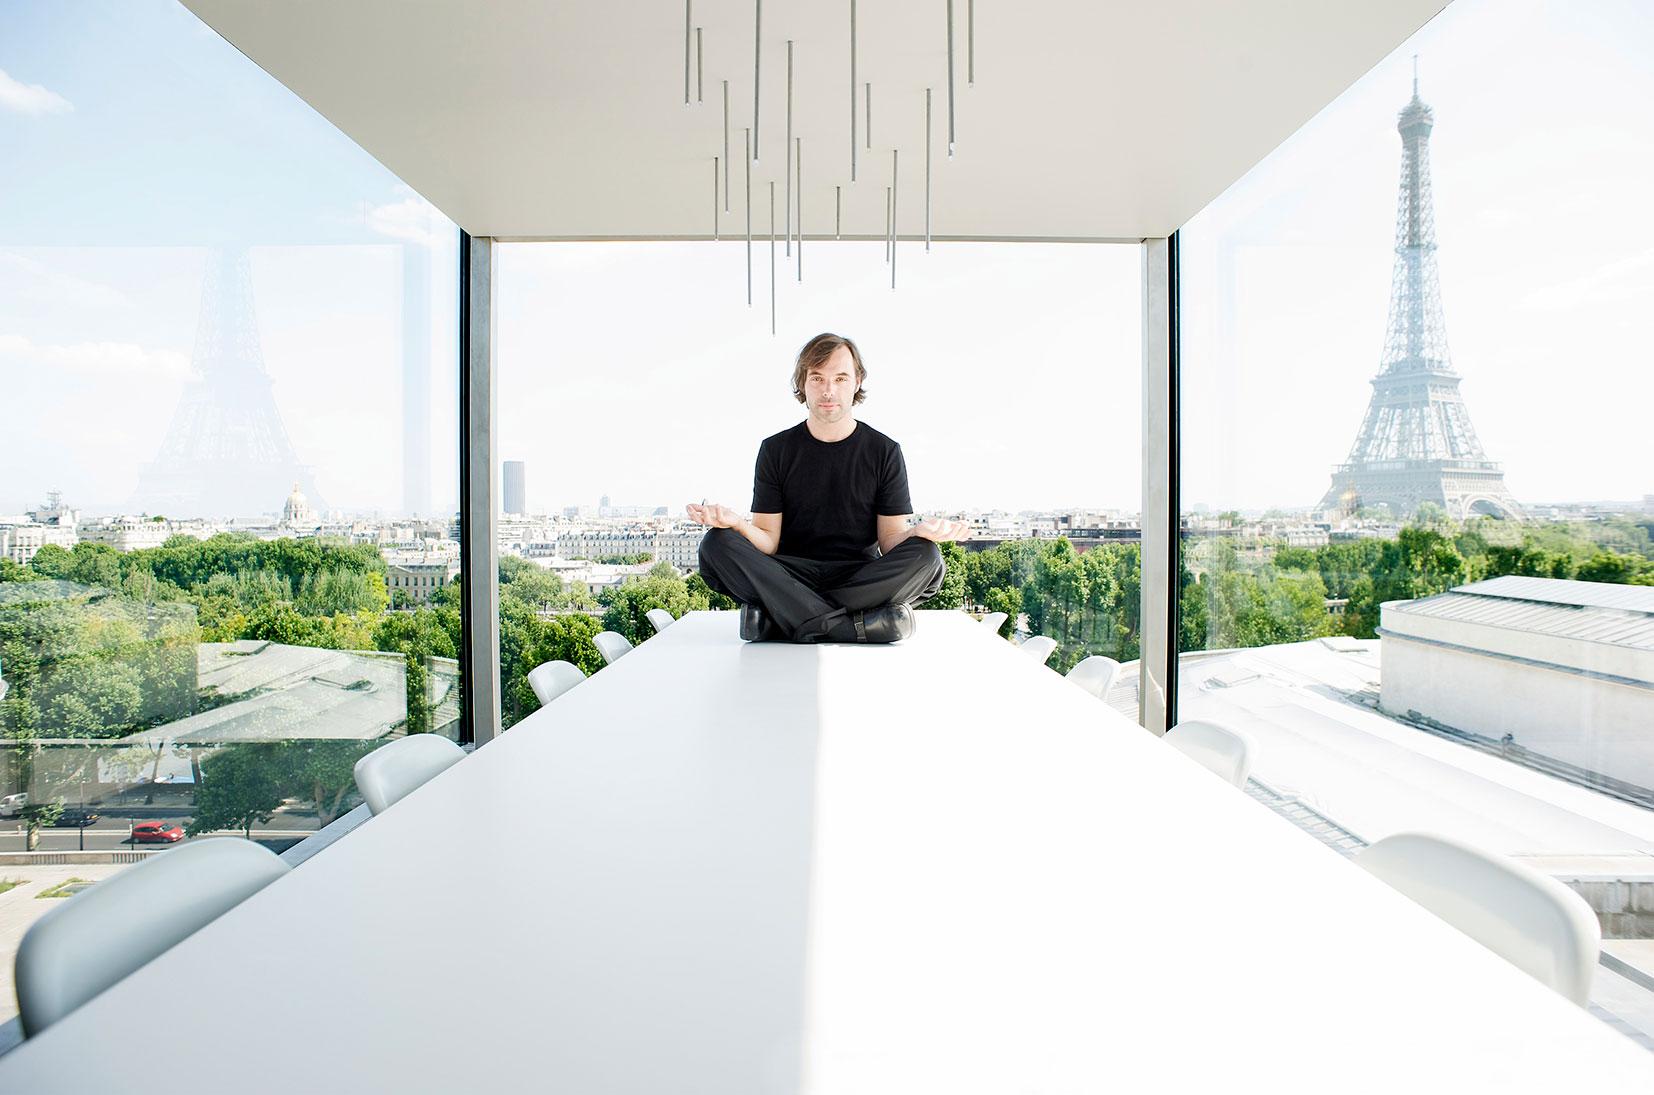 Gilles Stassart